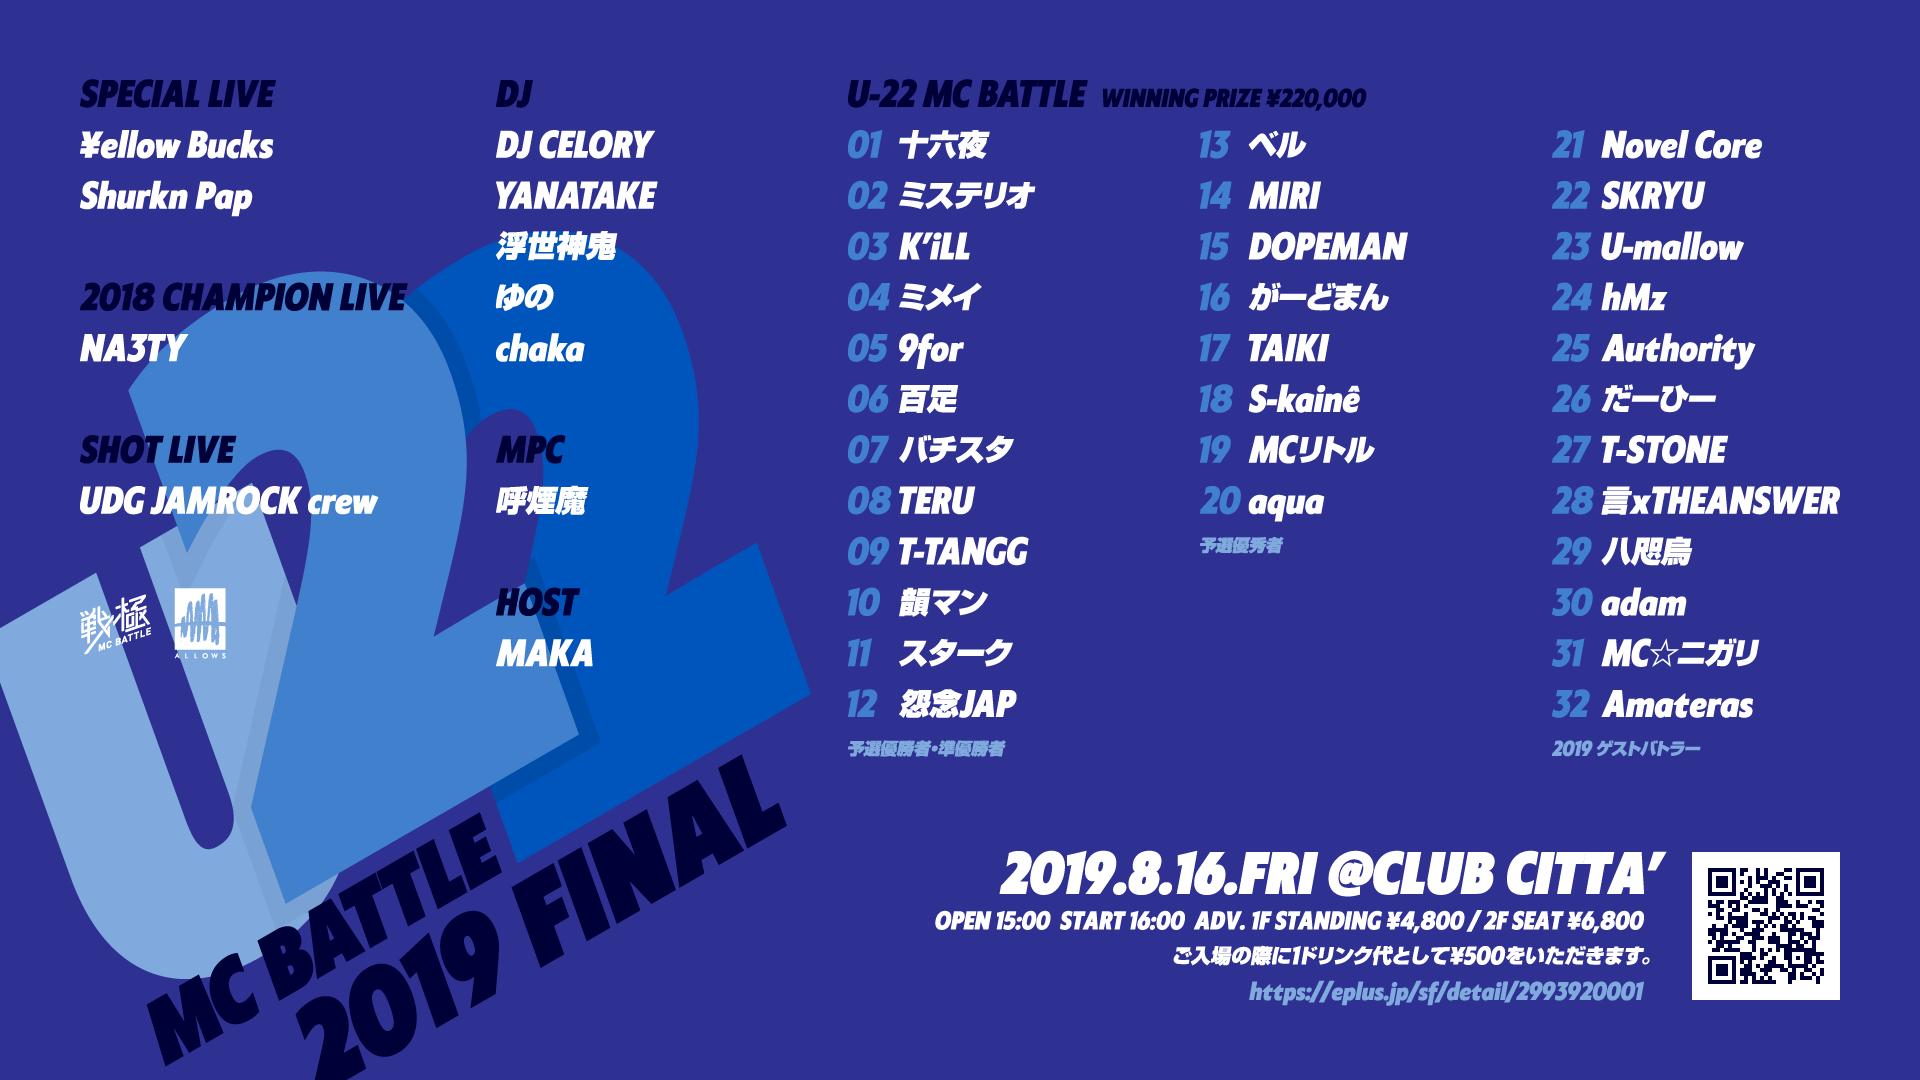 8/16 U-22 MCBATTLE 2019 FINAL チケット追加チケット販売!_e0246863_20083904.png